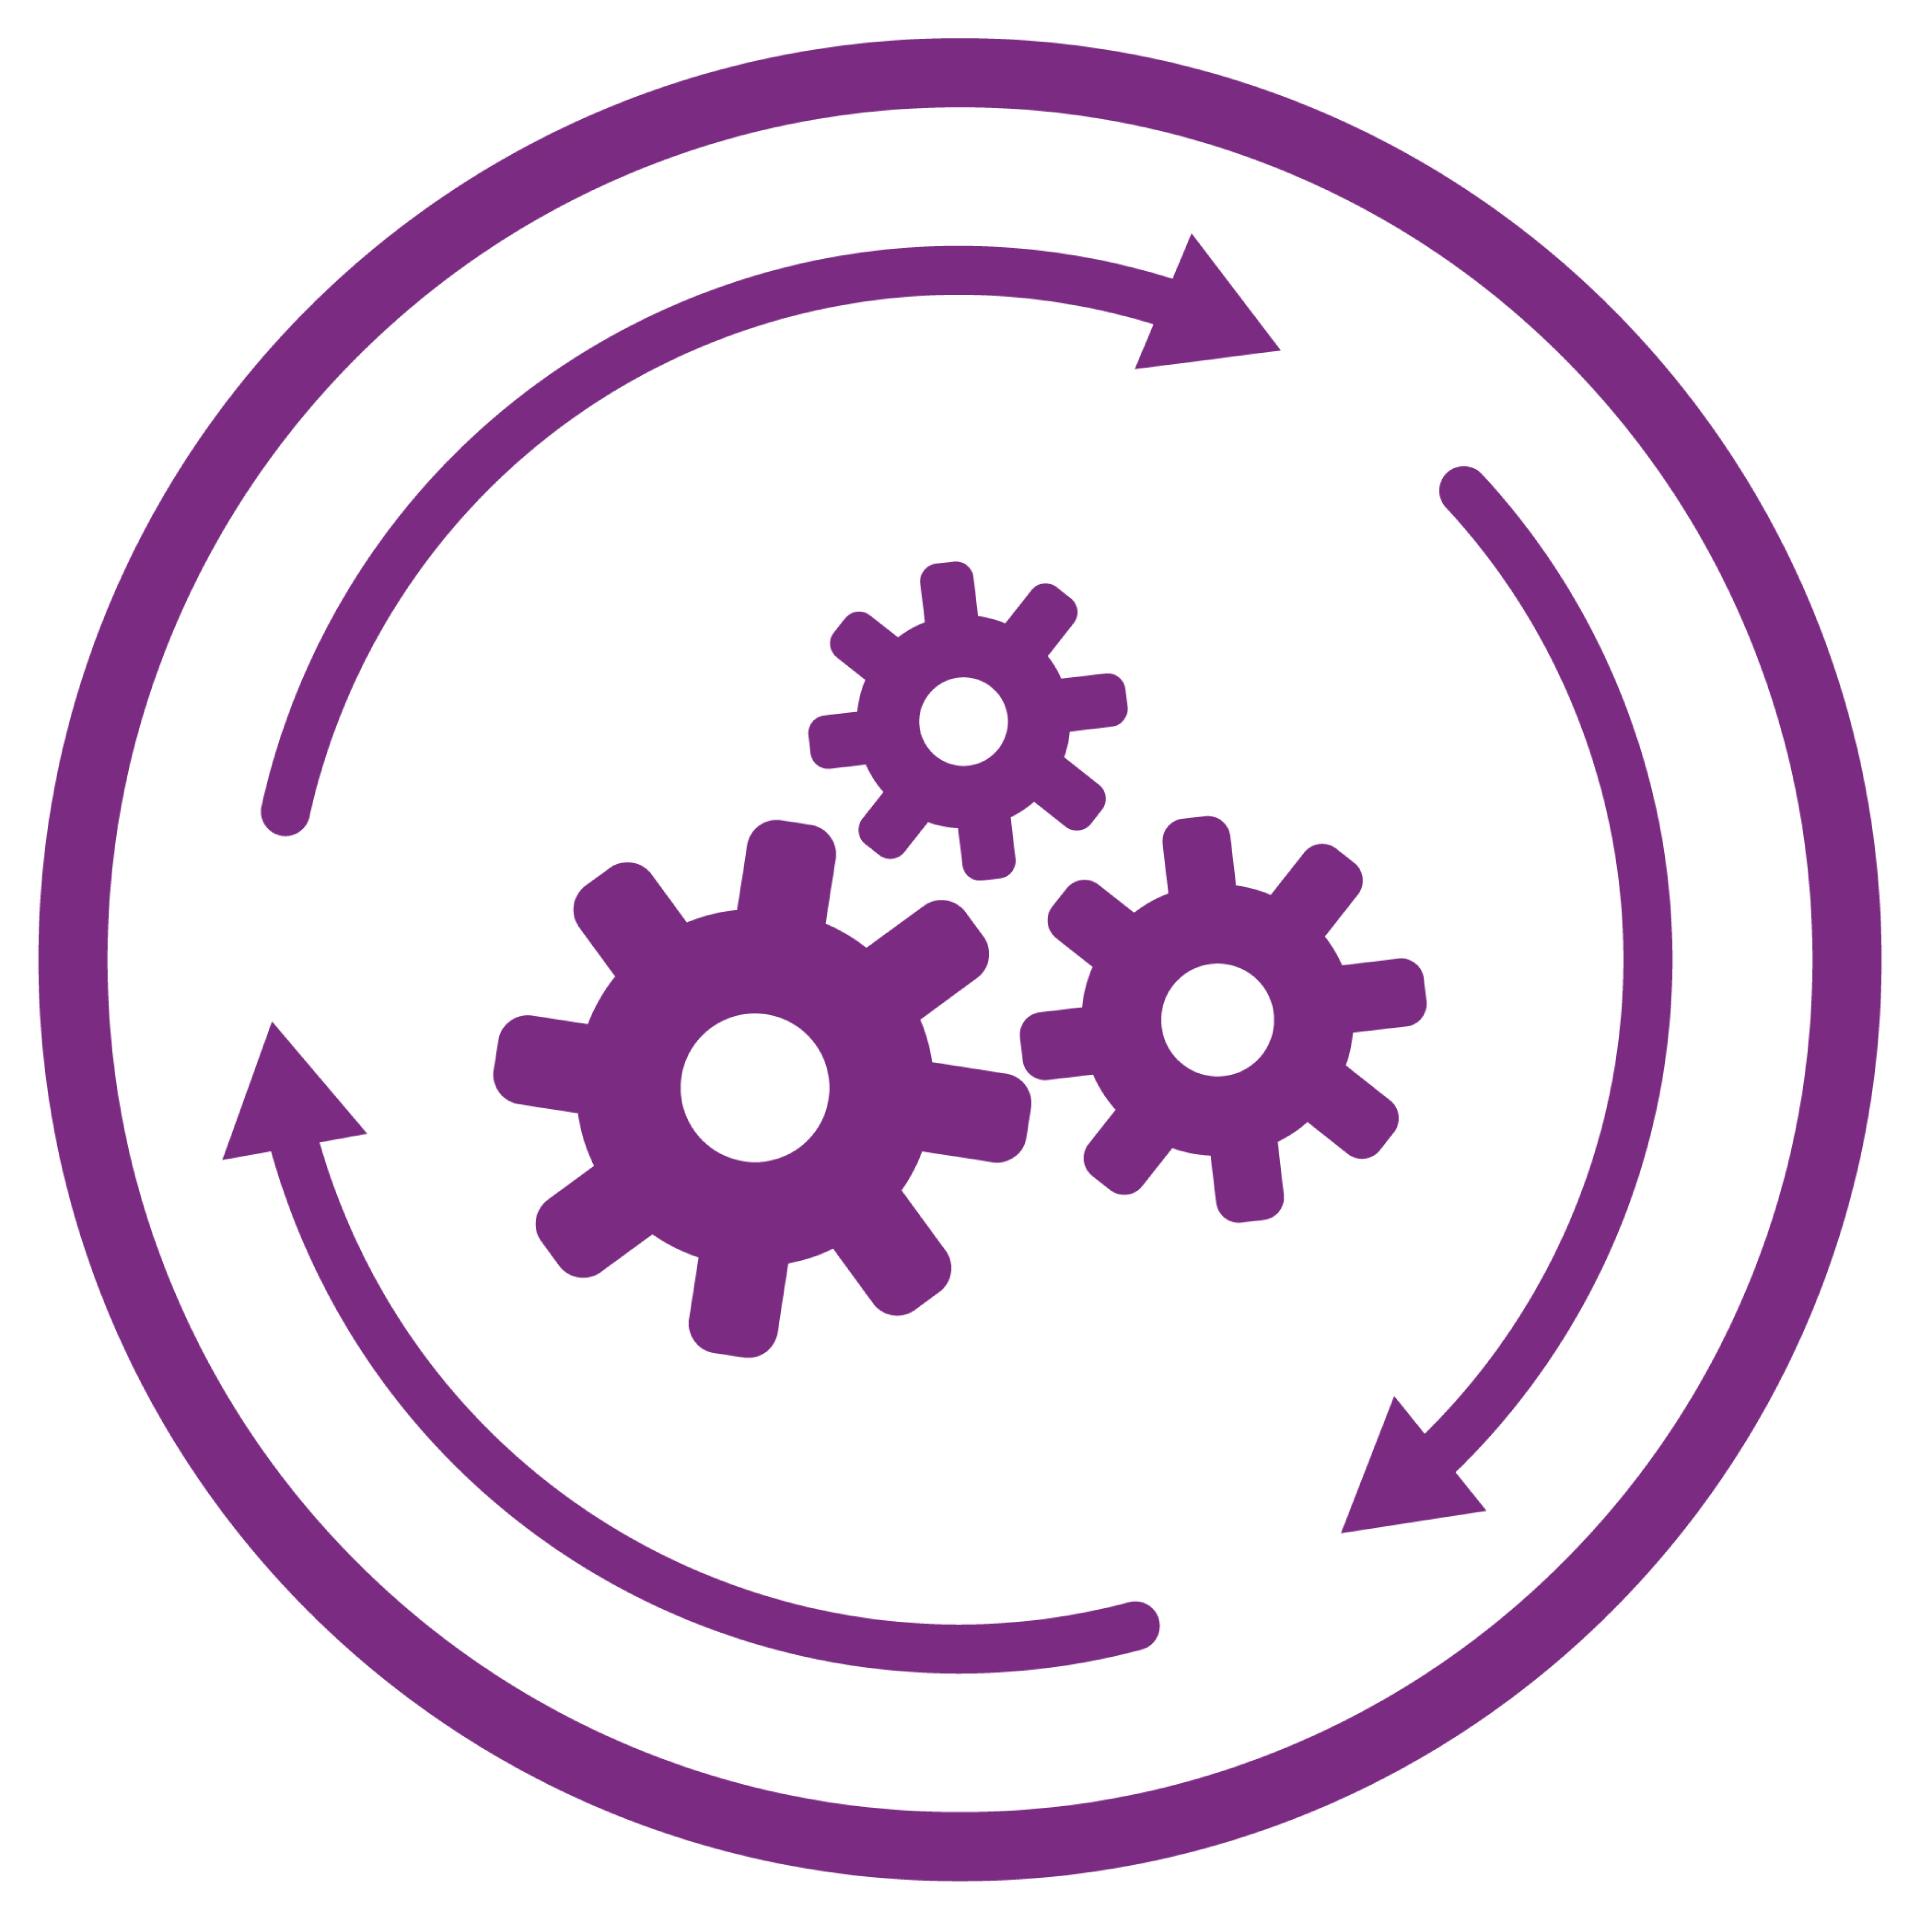 AmbulatoryIcon_Operational efficiency_purple_gears